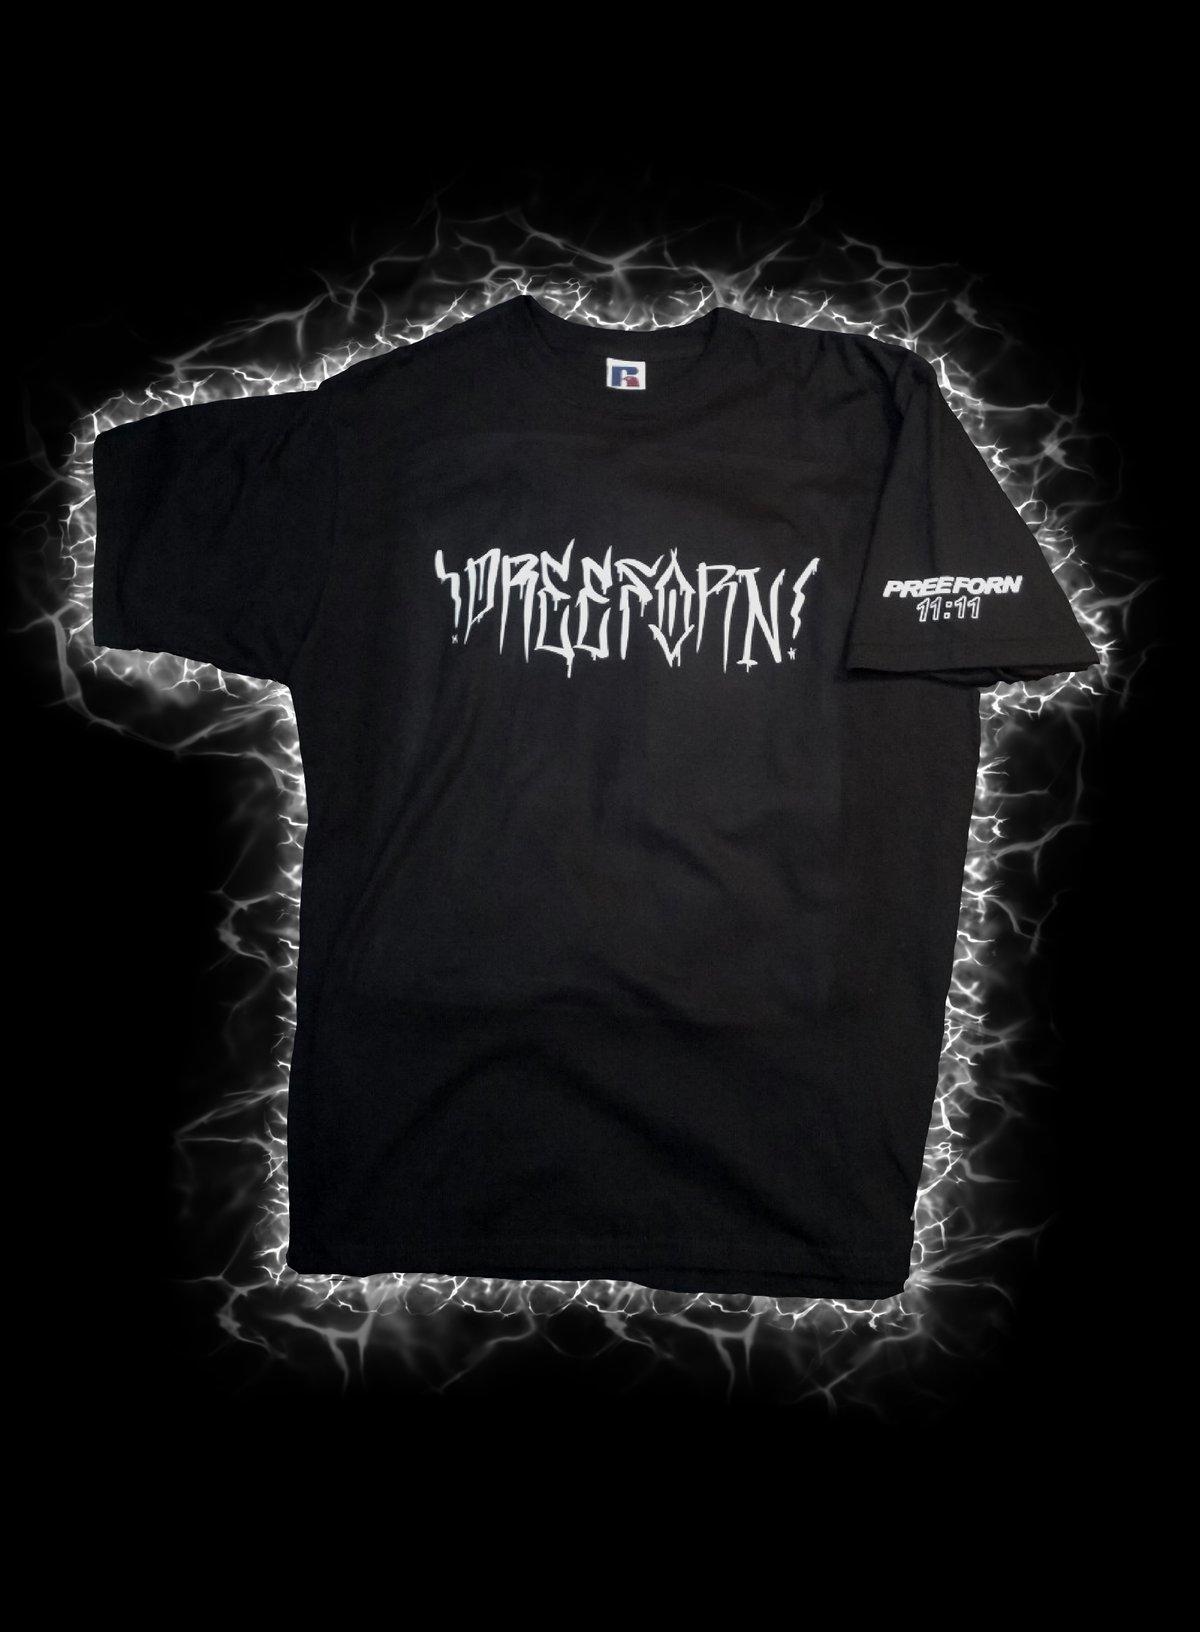 Image of PREE FORN 11;11 screaming melting nazi t-shirt